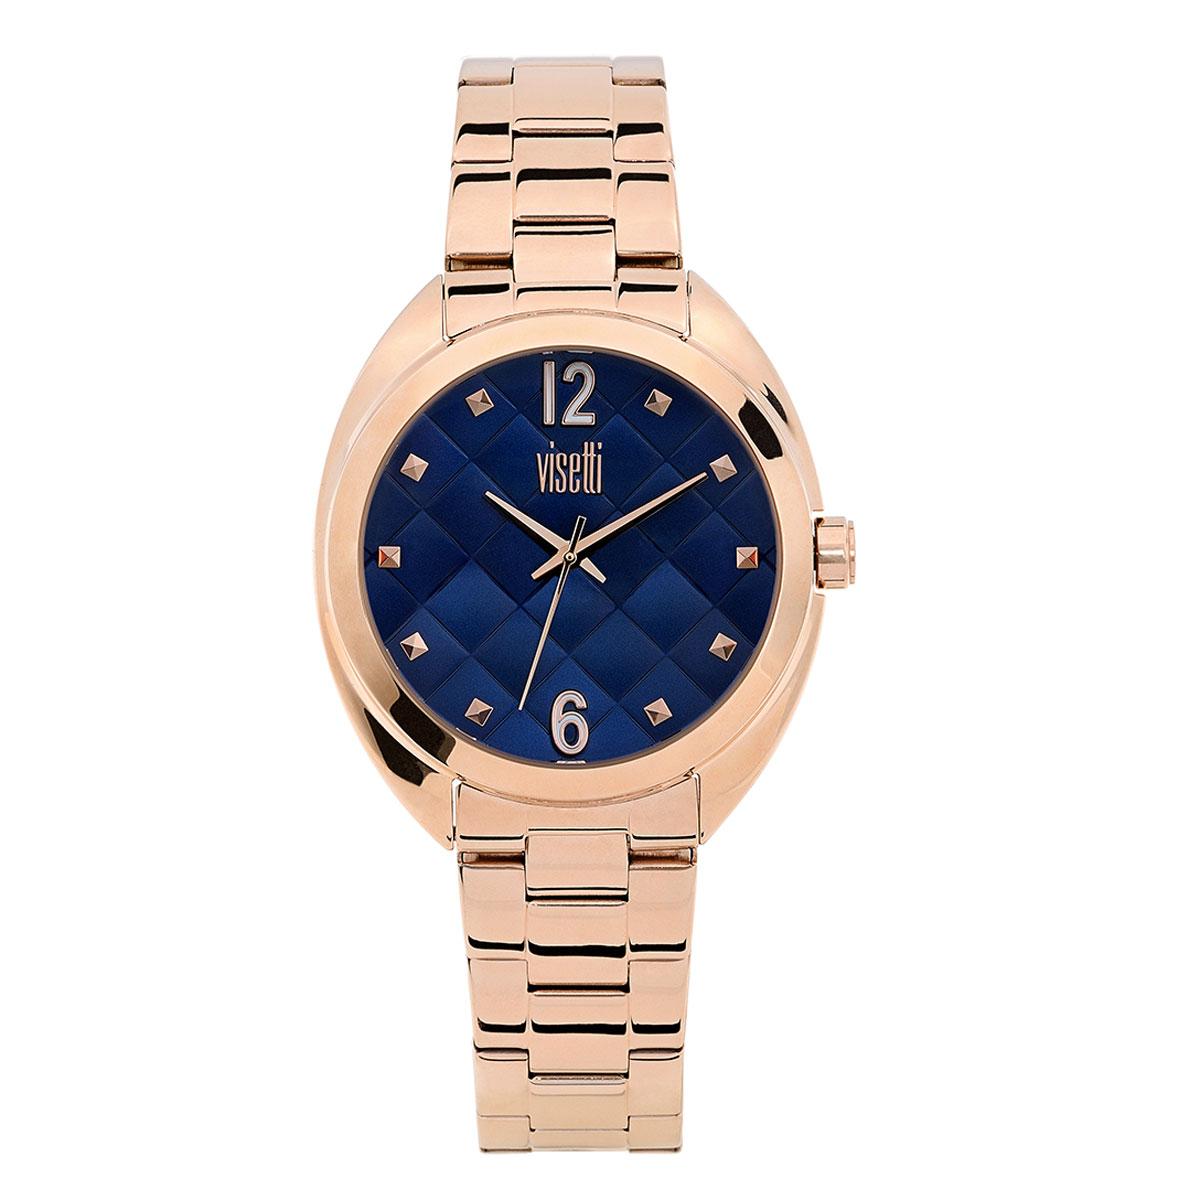 Visetti γυναικείο ρολόι με ροζ χρυσή ατσάλινη κάσα και μπρασελέ. ZE-992-RC 0d3db860a7d